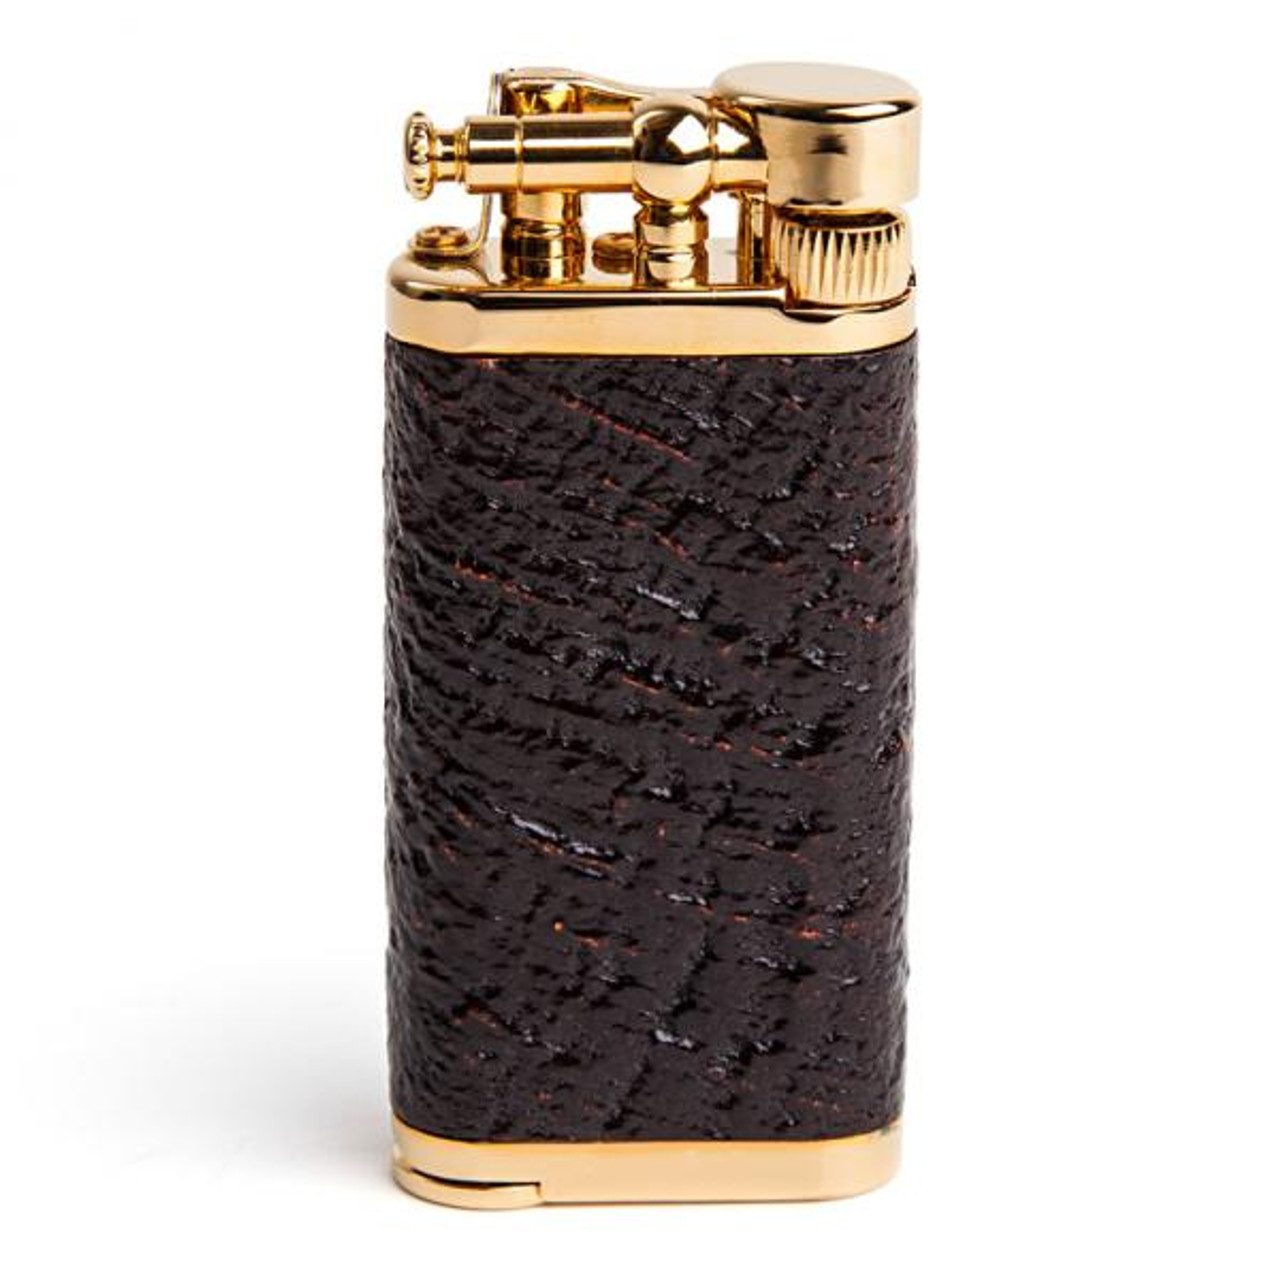 IM Corona Old Boy Sand Blast Briar with Gold Plate Lighter